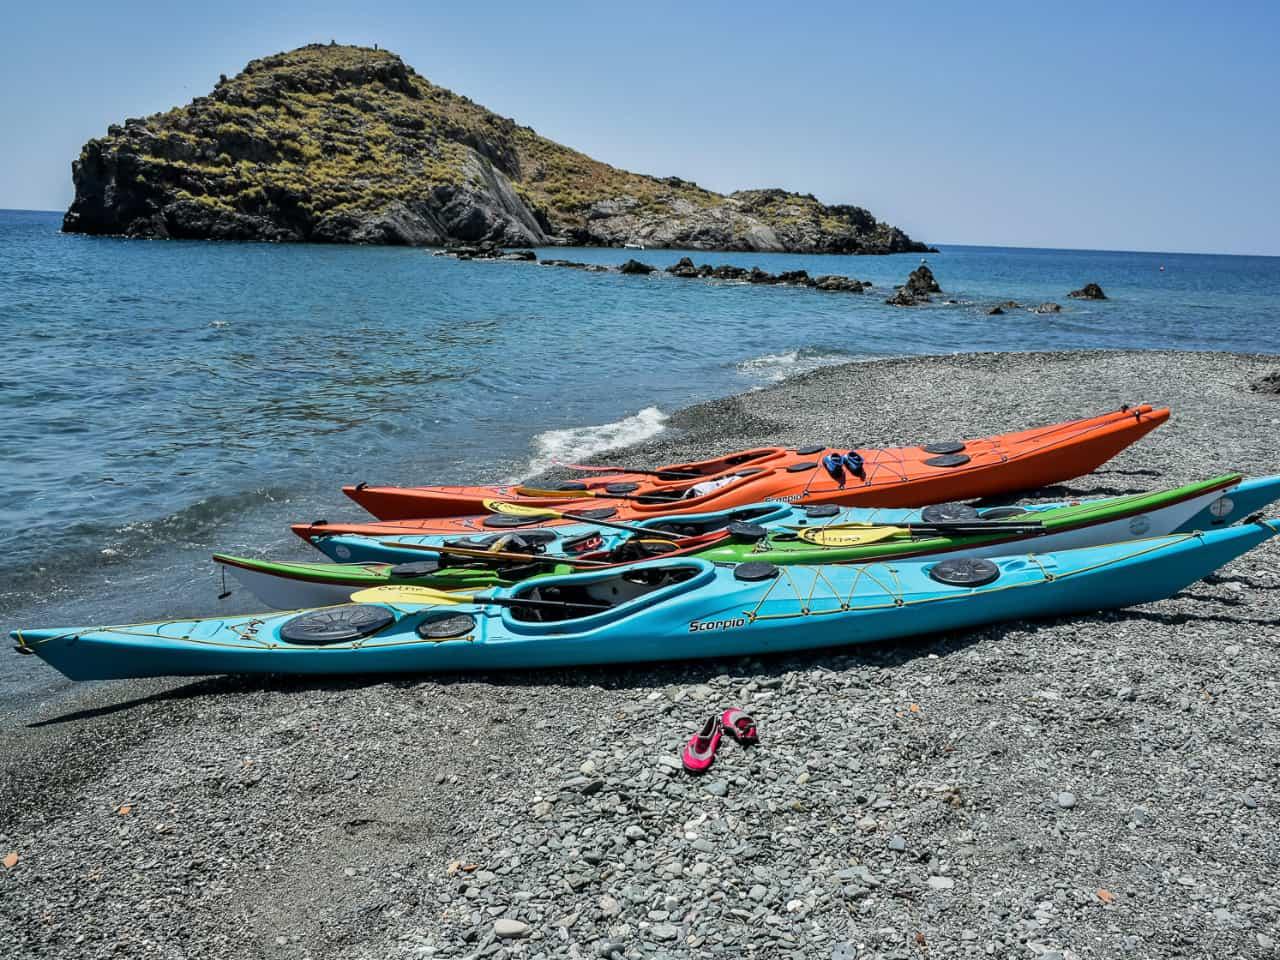 Sea Kayak Kaloi Limenes Lentas, best day trip sea kayak, sea kayak kali limenes matala agia galini, best sea kayak trip crete